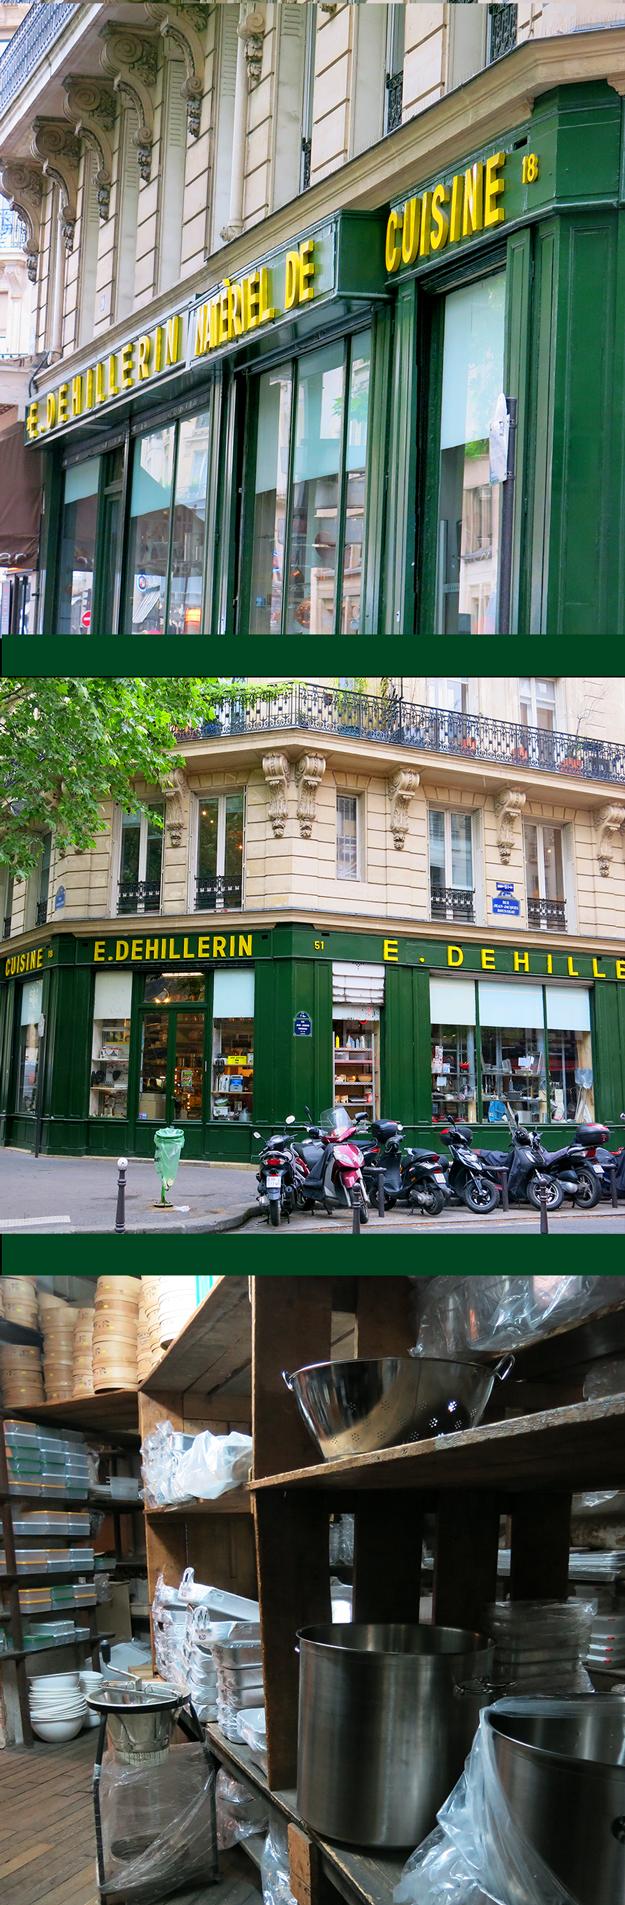 E. Dehillerin, Paris France